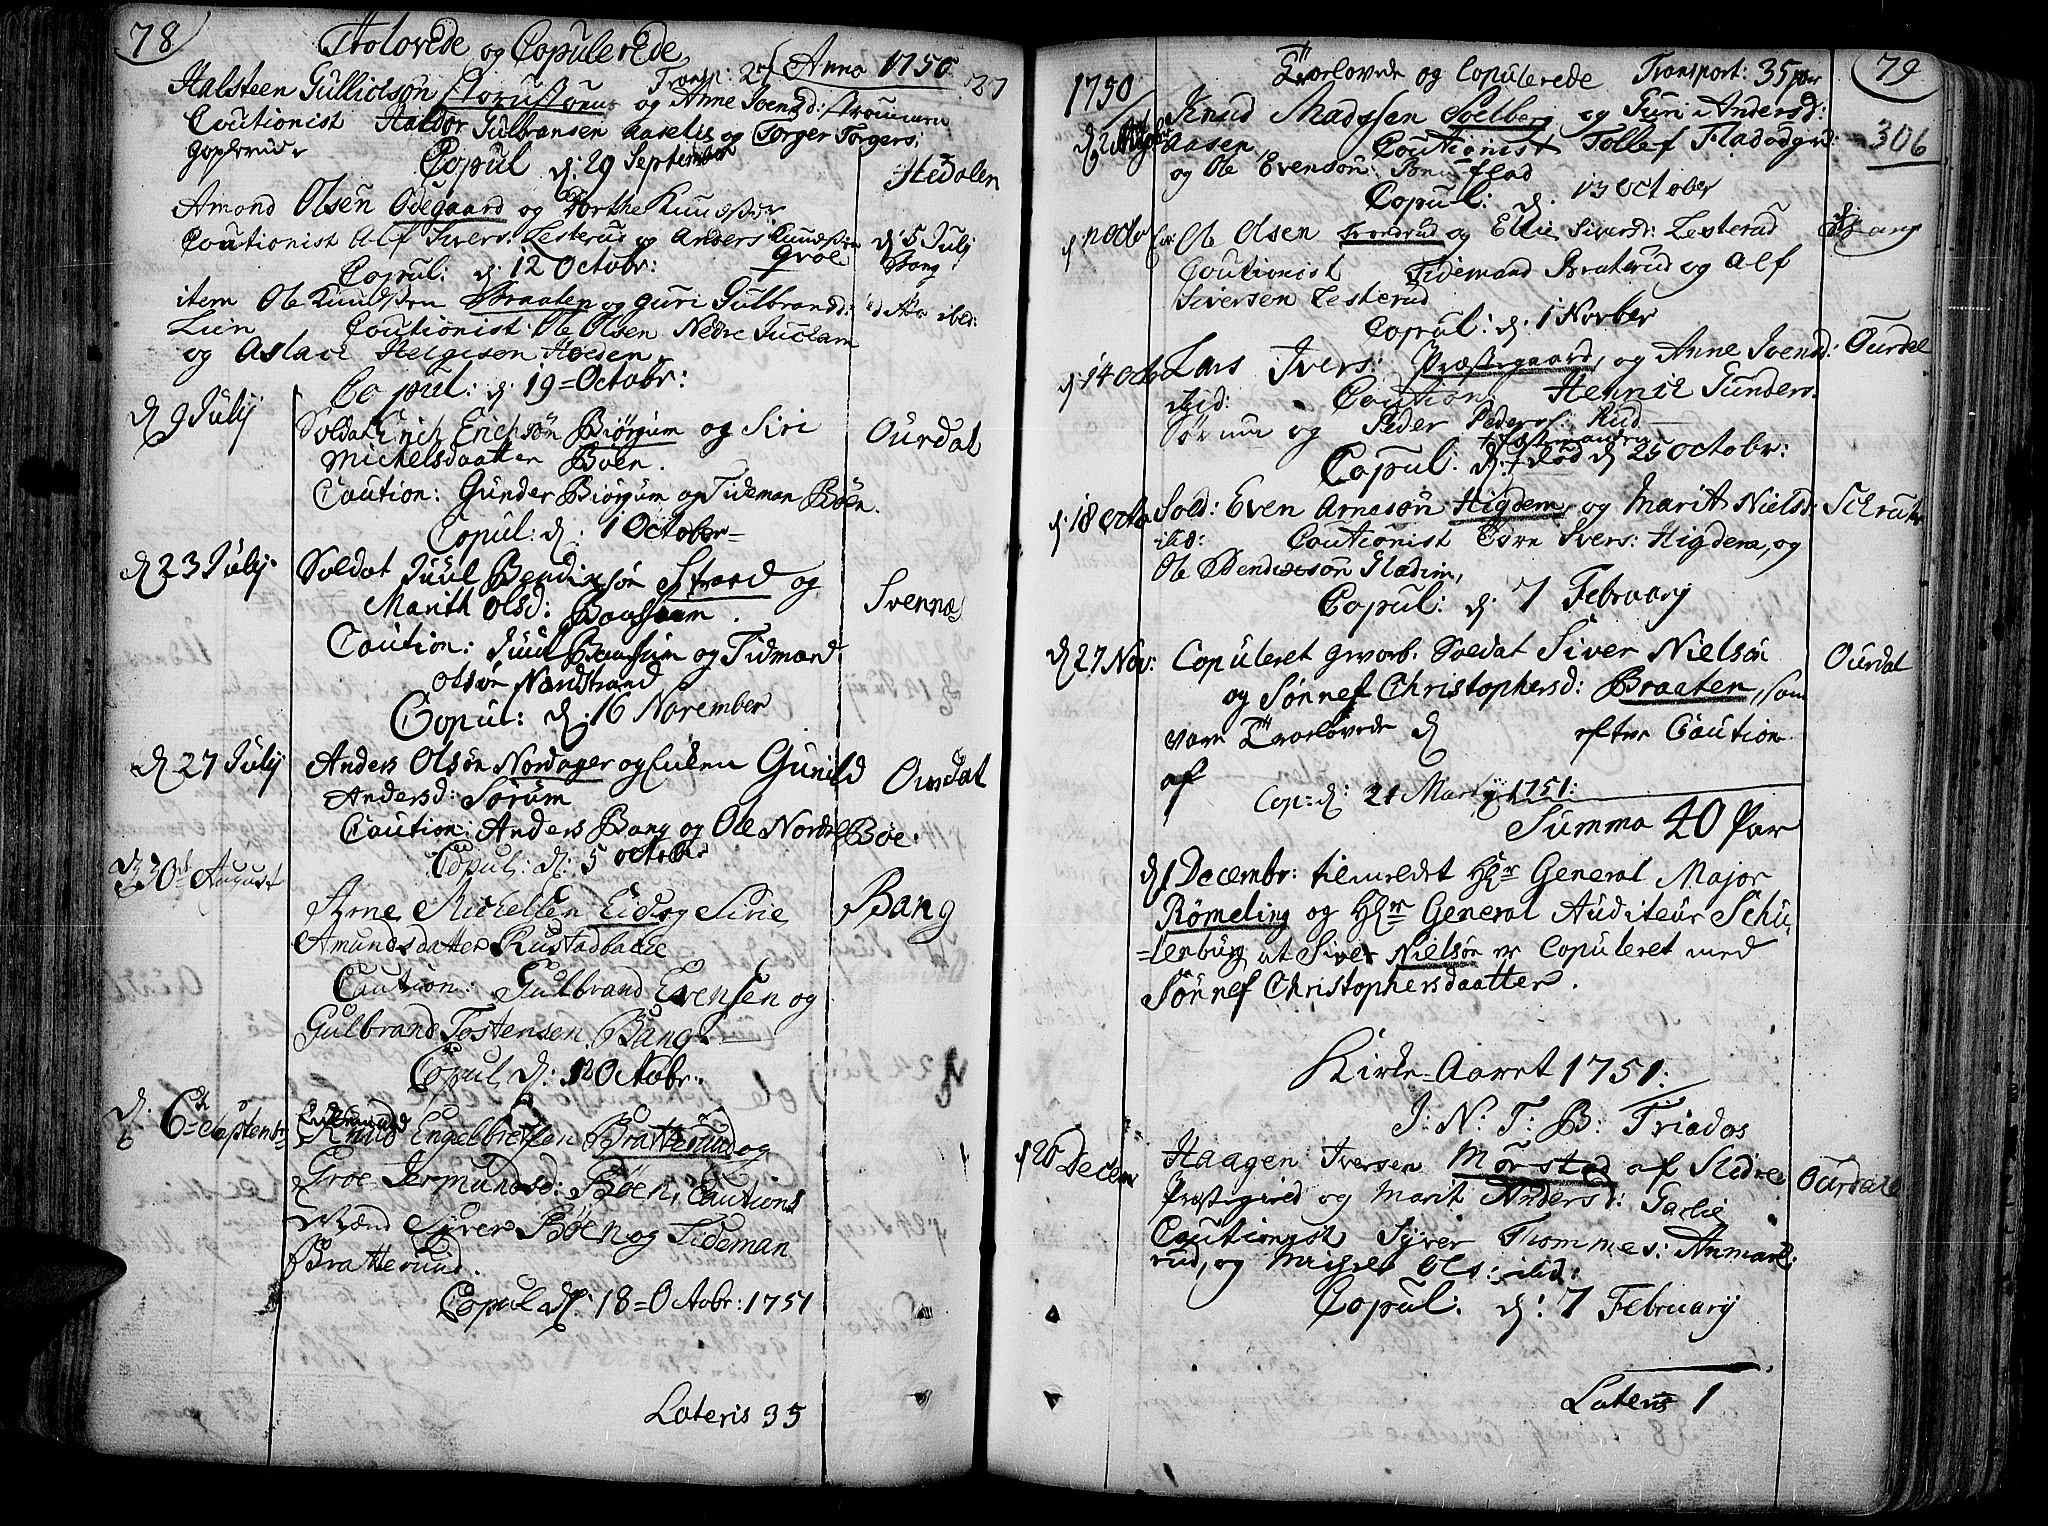 SAH, Aurdal prestekontor, Ministerialbok nr. 4, 1730-1762, s. 78-79